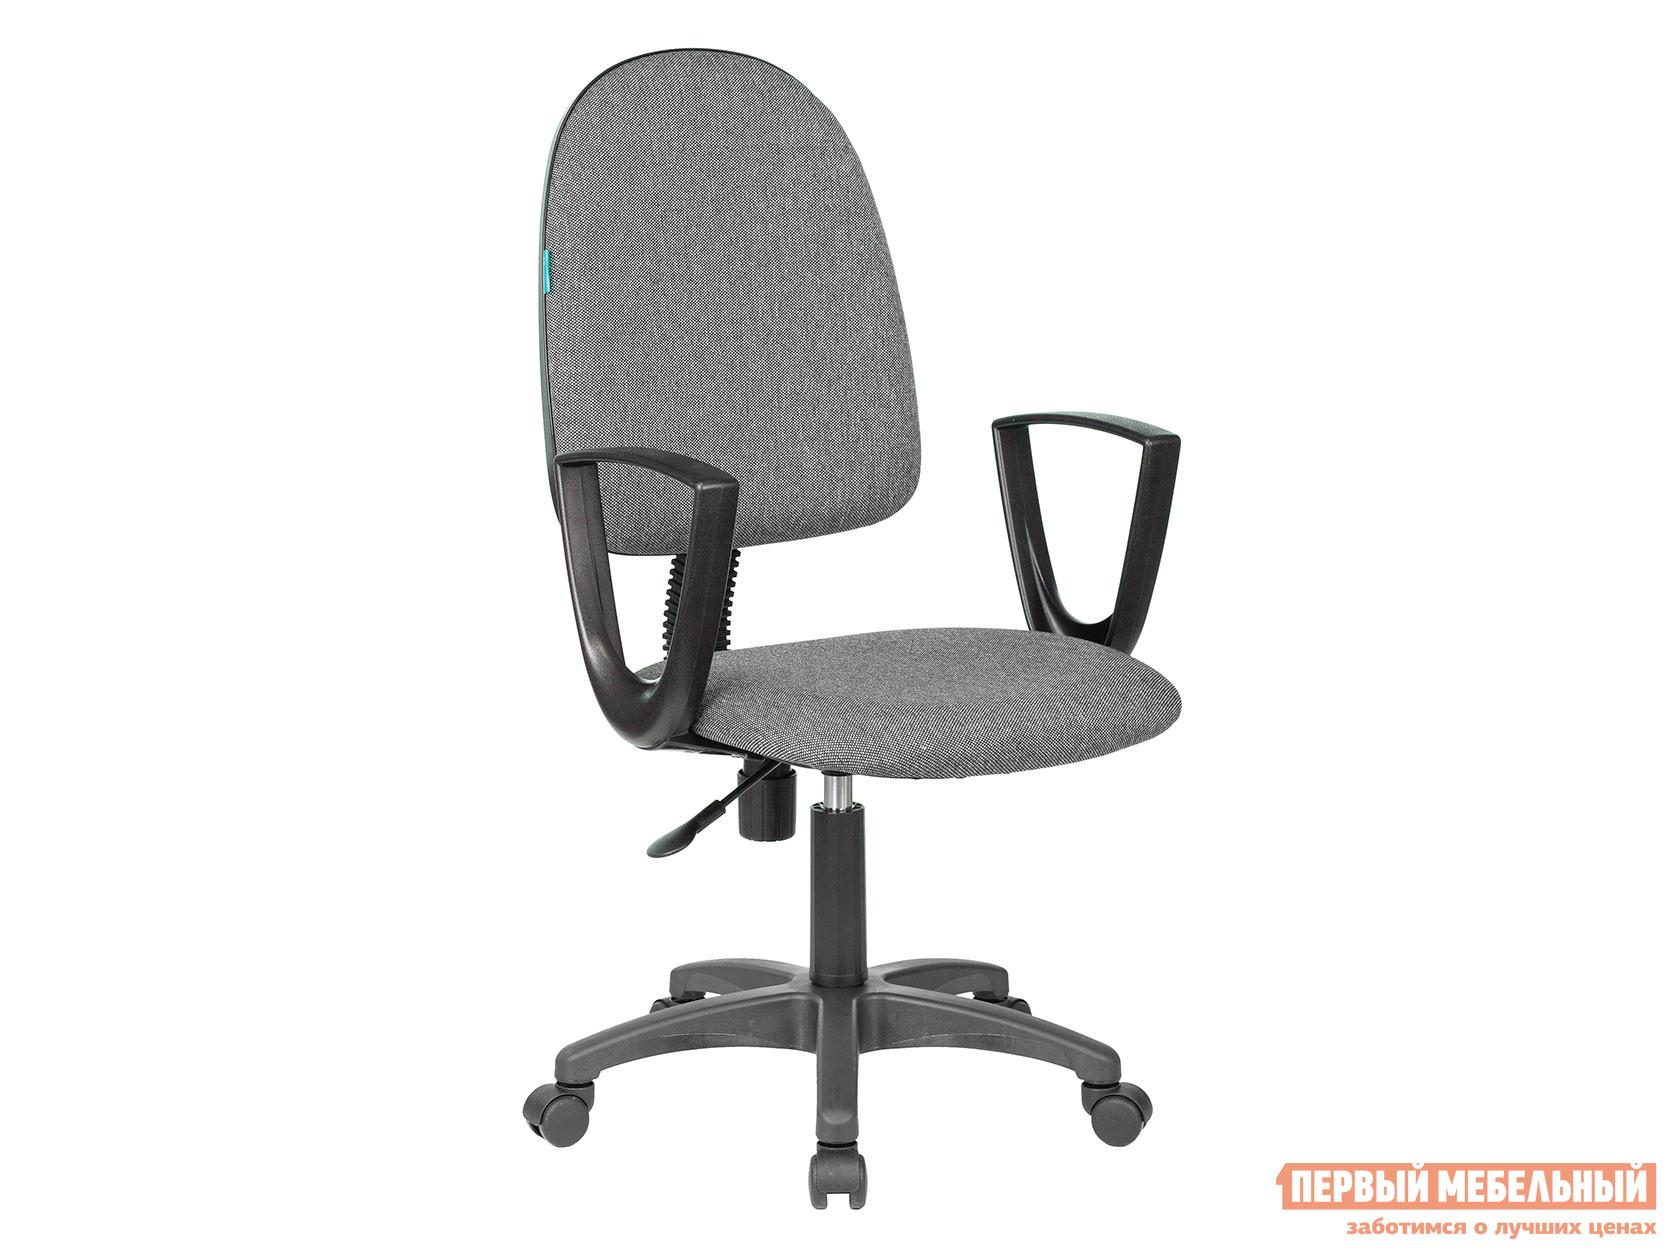 Офисное кресло  CH-1300N 3C1 Серый ткань.